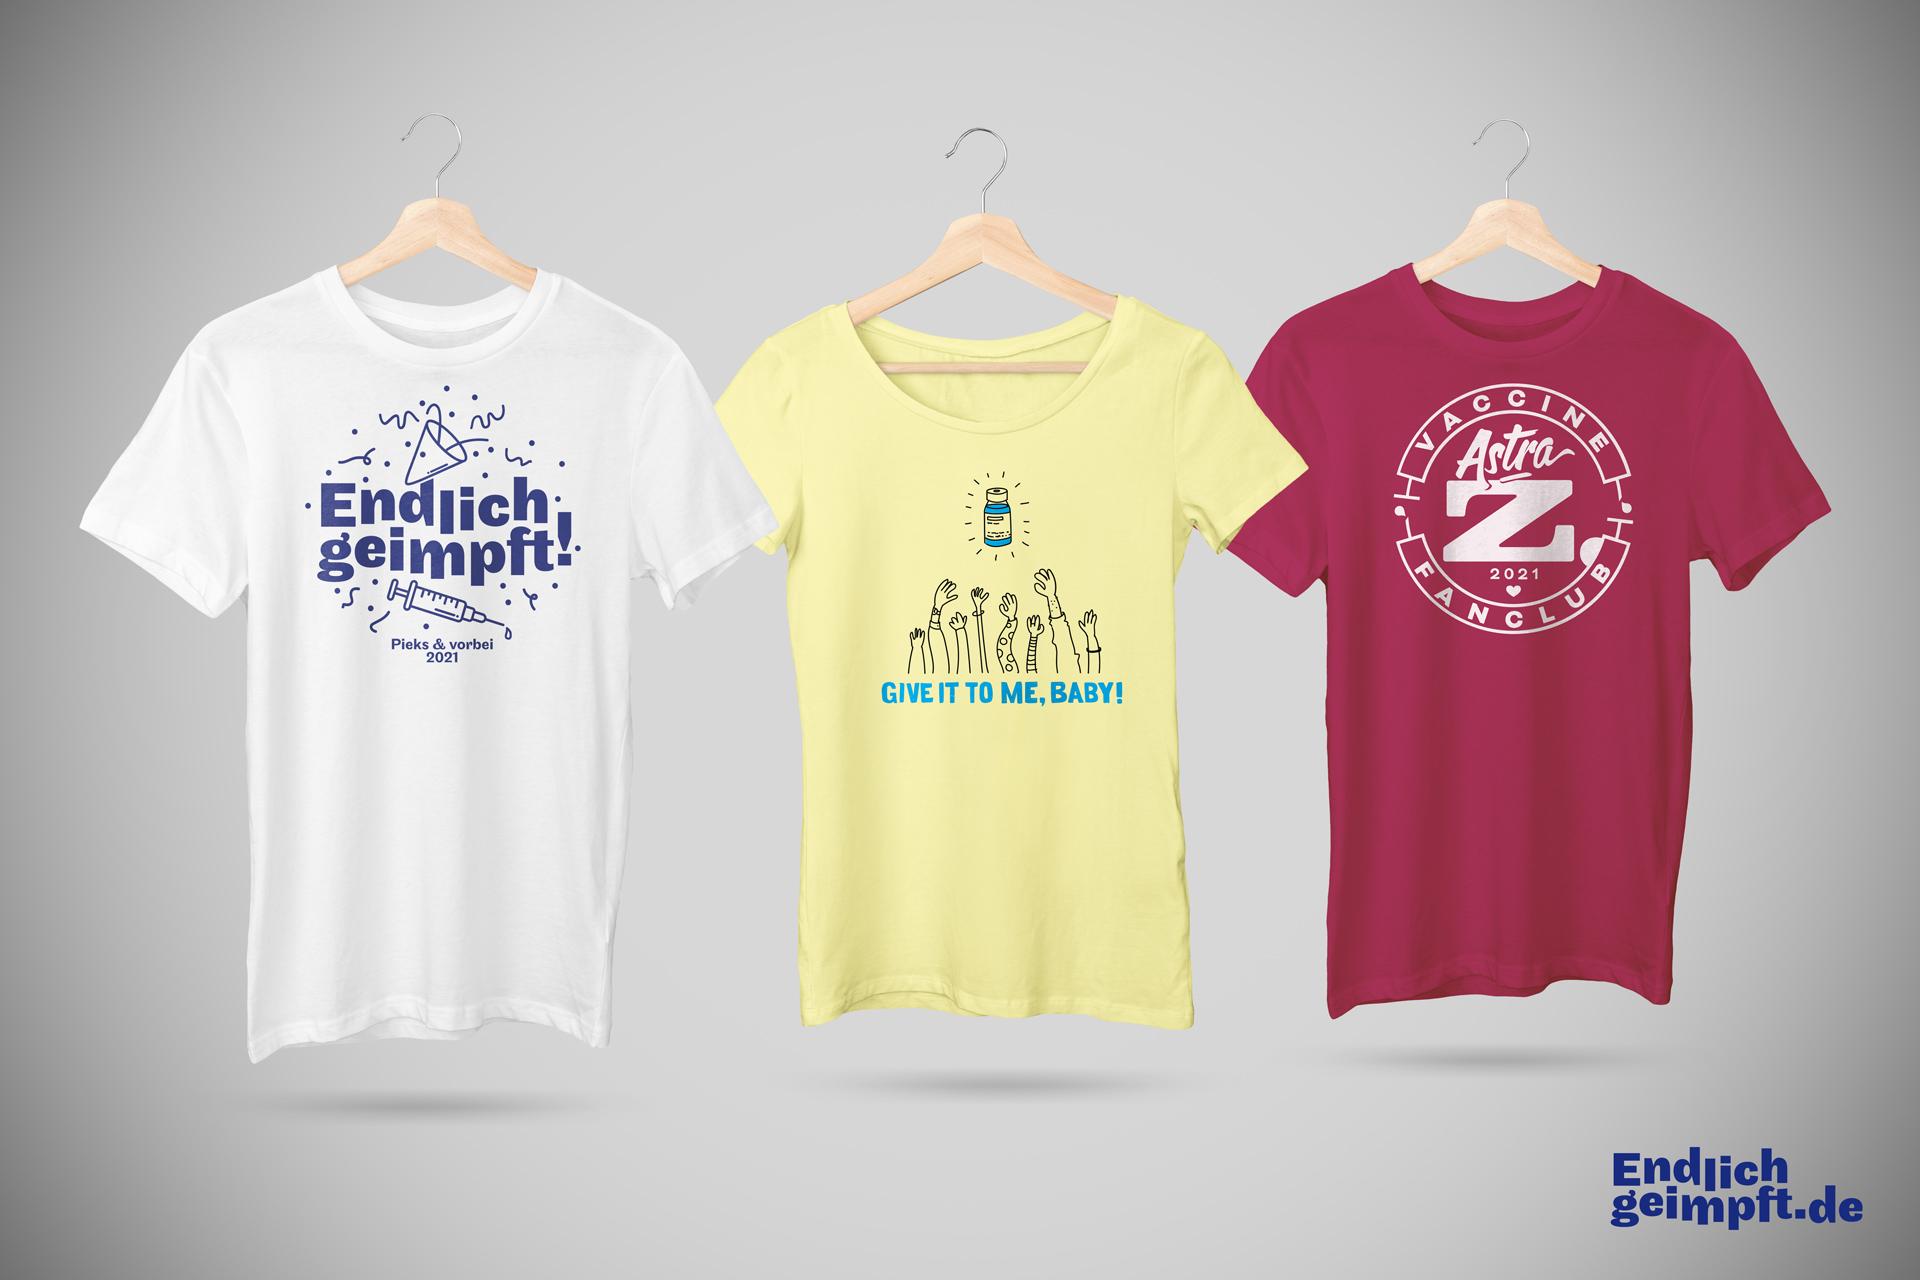 Mockup-Bild dreier T-Shirt mit positiven Impf-Motiven